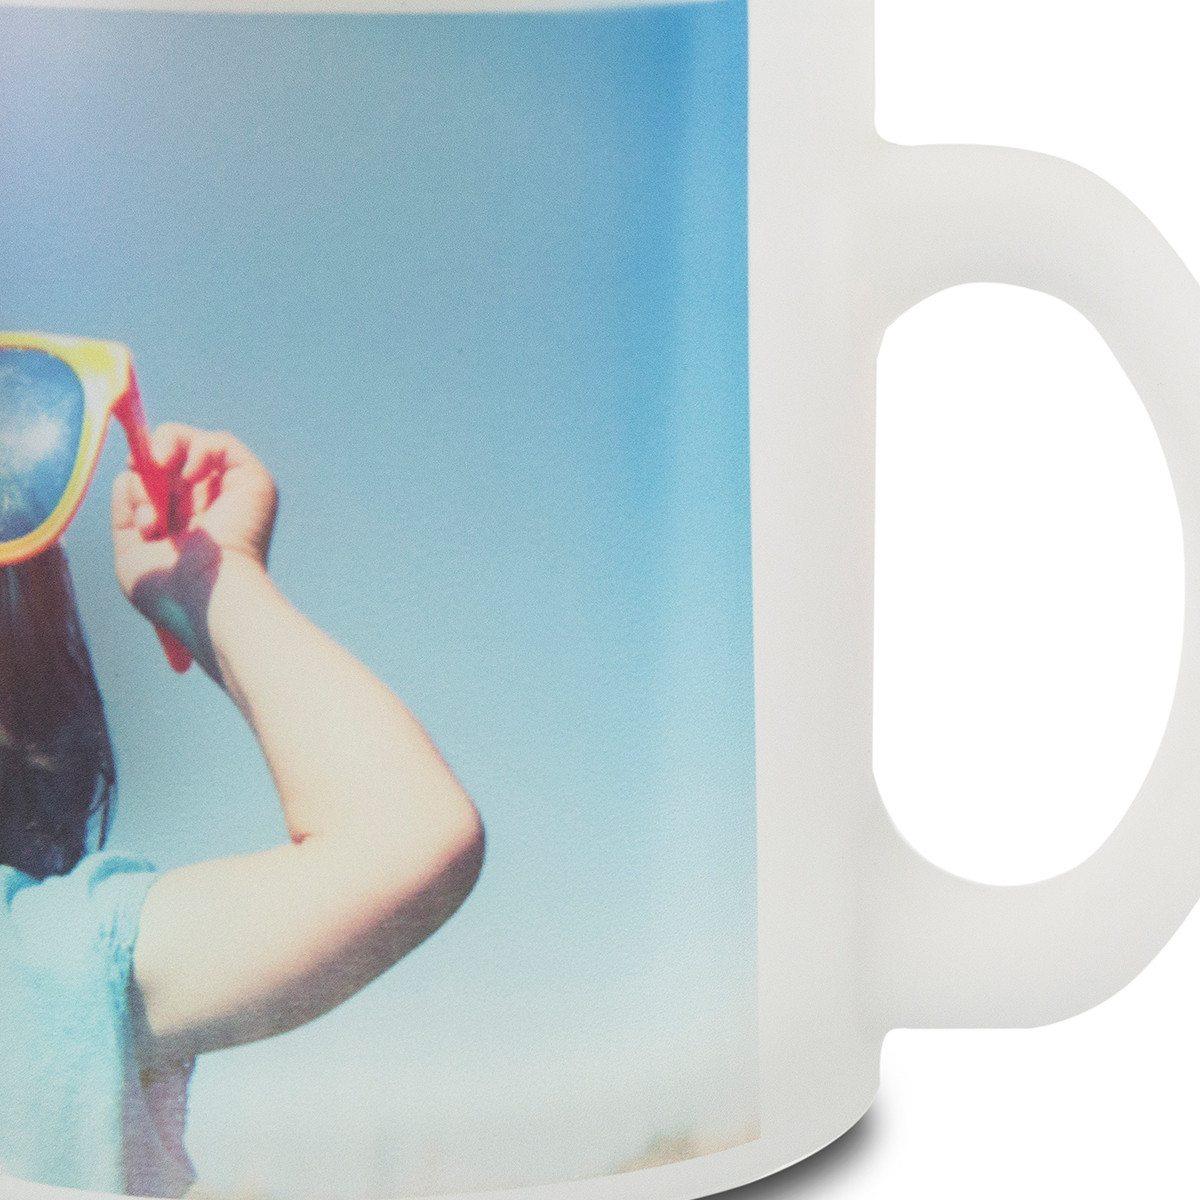 Fototasse aus satiniertem Glas